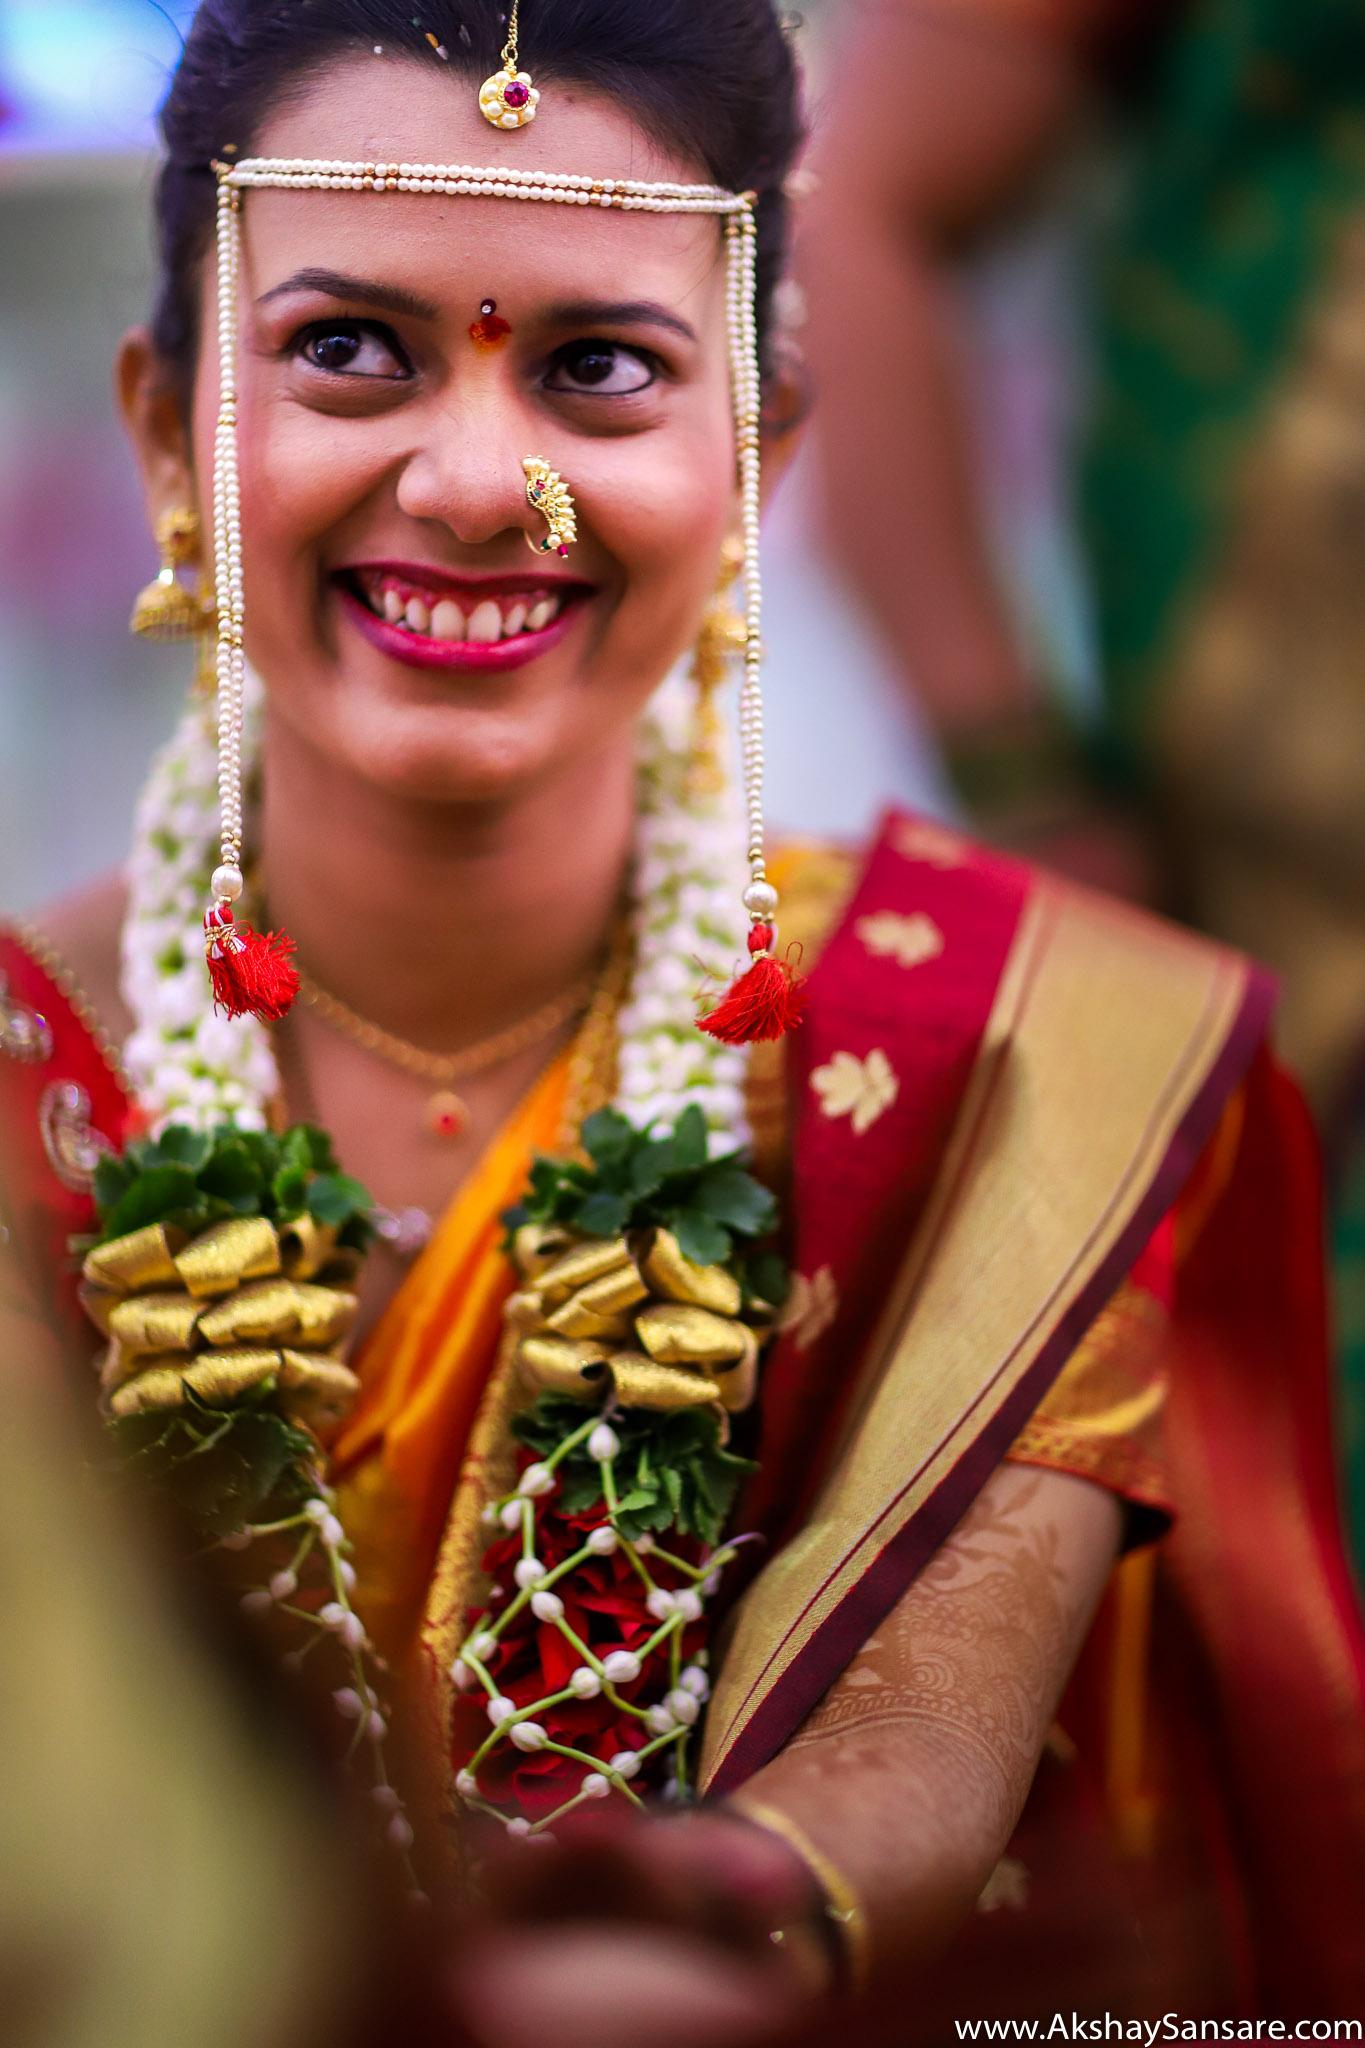 Aditya x Poonam Blog Akshay Sansare Photography Candid Photographer in Mumbai Best Cinematic wedding film filmer-15.jpg